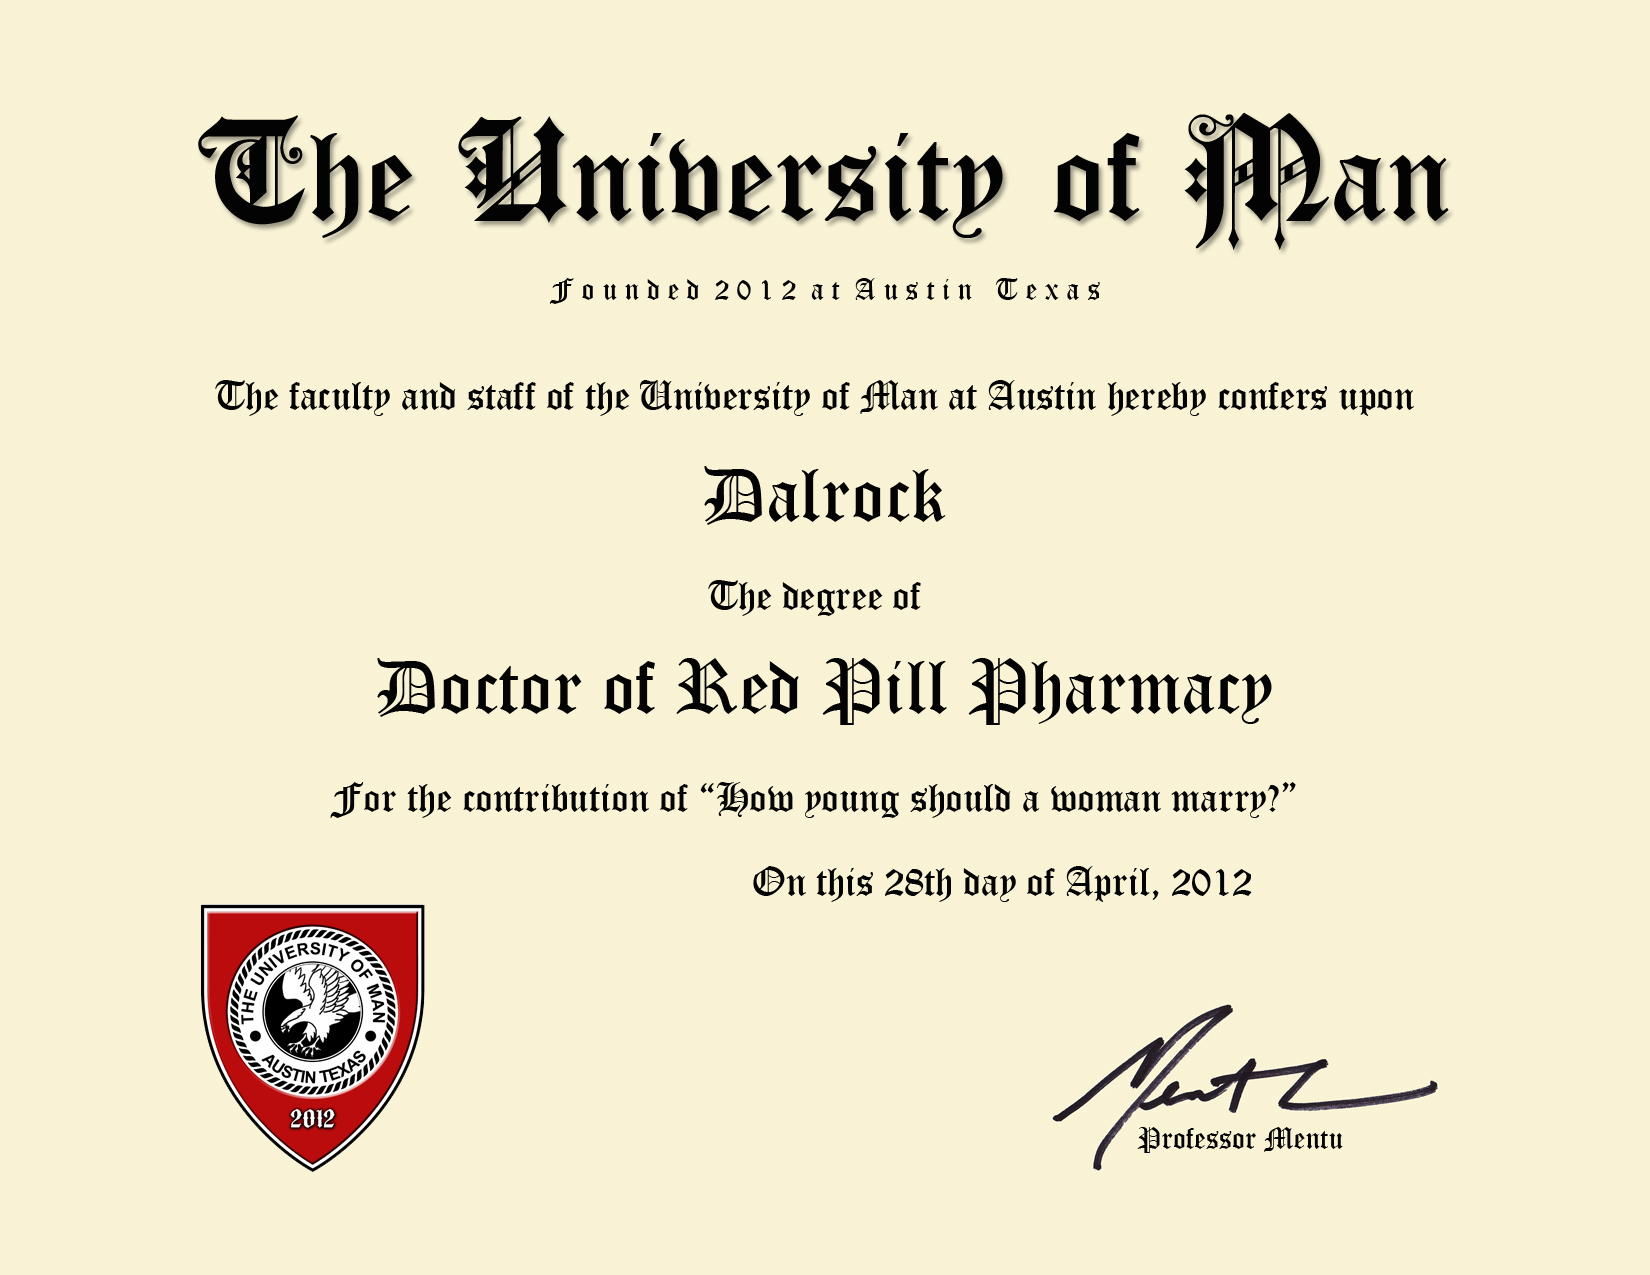 Phd degree pharmacy